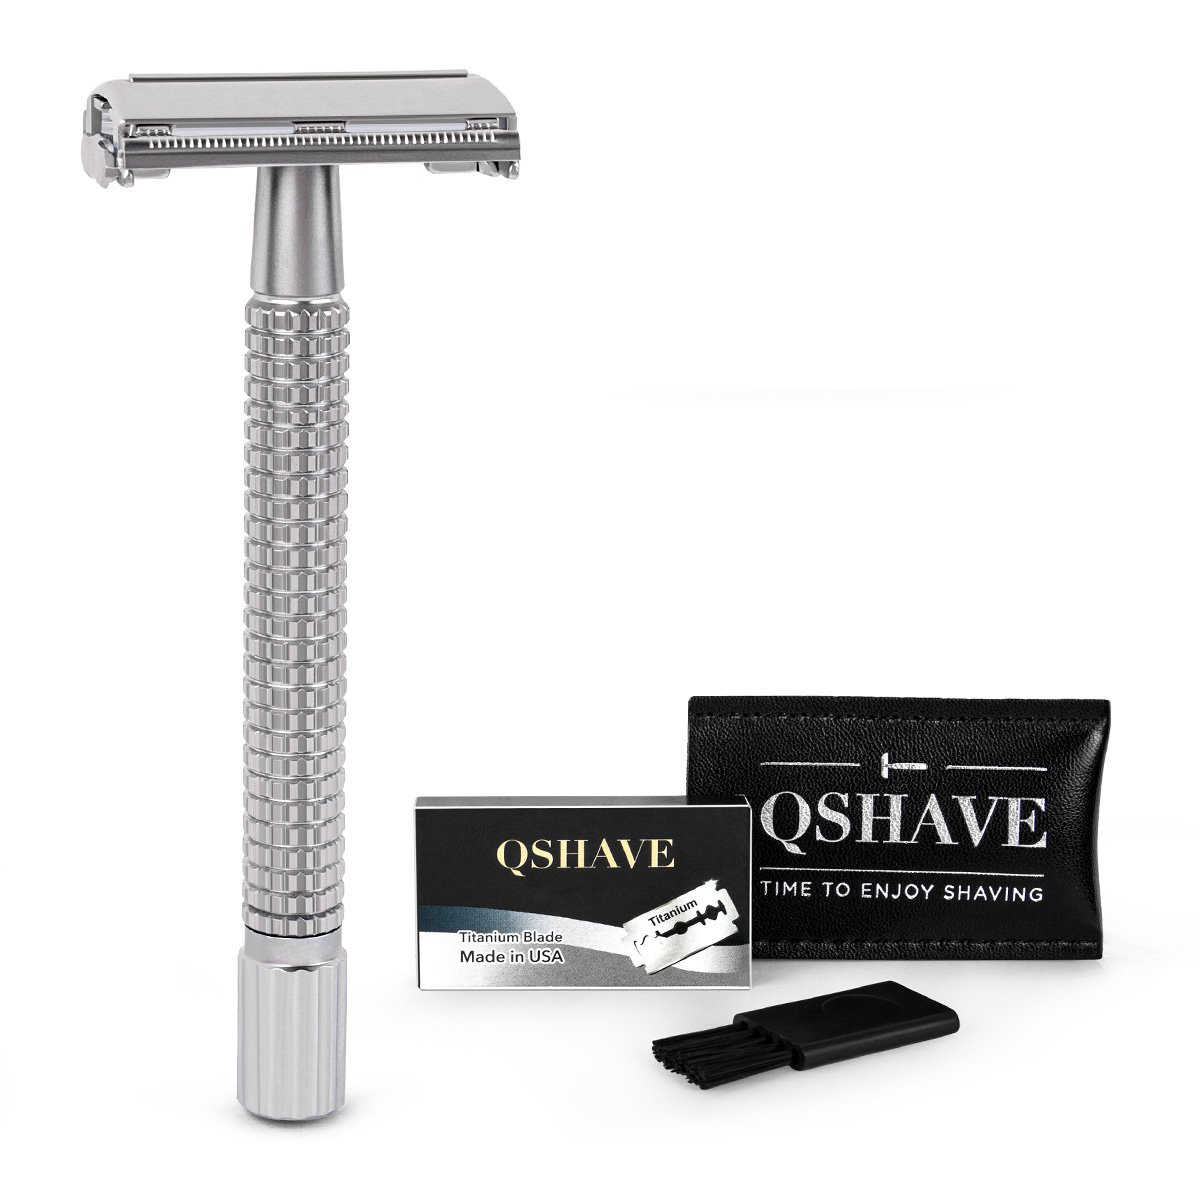 QSHAVE Double Edge 4 inch Long Handle Safety Razor Twist Butterfly Open Chrome Matte Finish (1 Razor + 5 pcs Titanium Coated Blades)